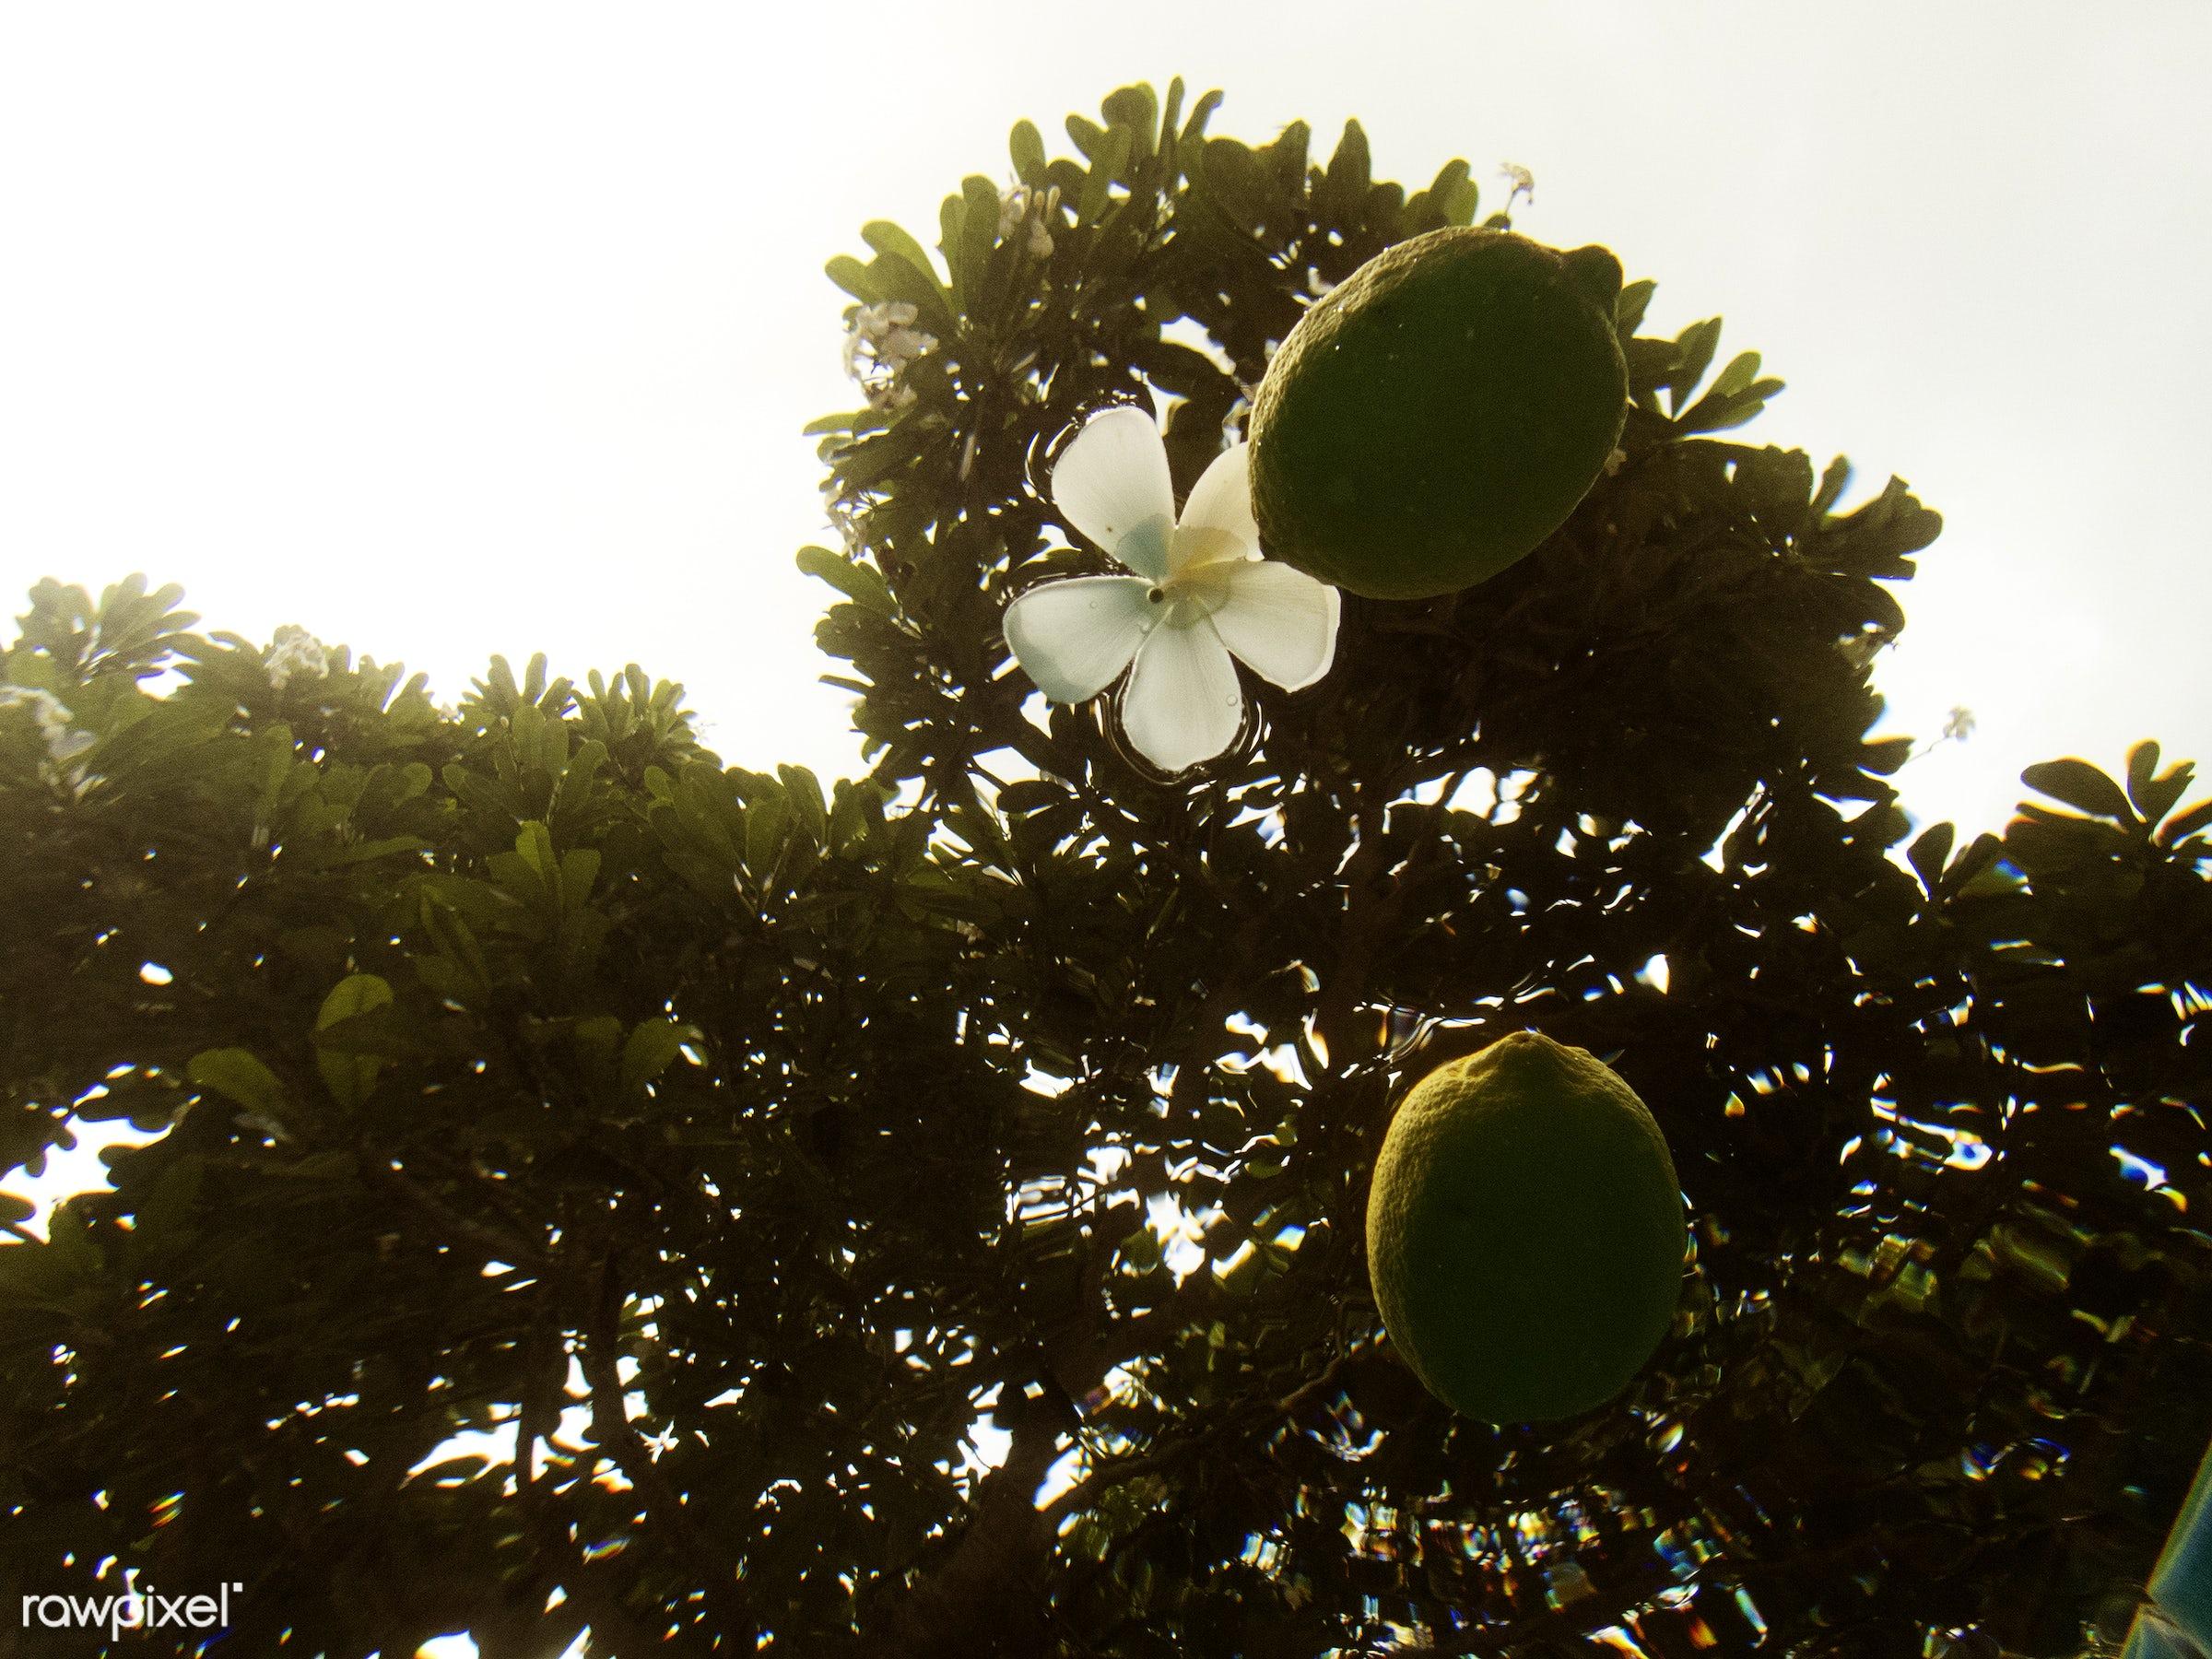 water, plumeria, plant, tree, nature, outdoors, summer, frangipani, flower, lemon